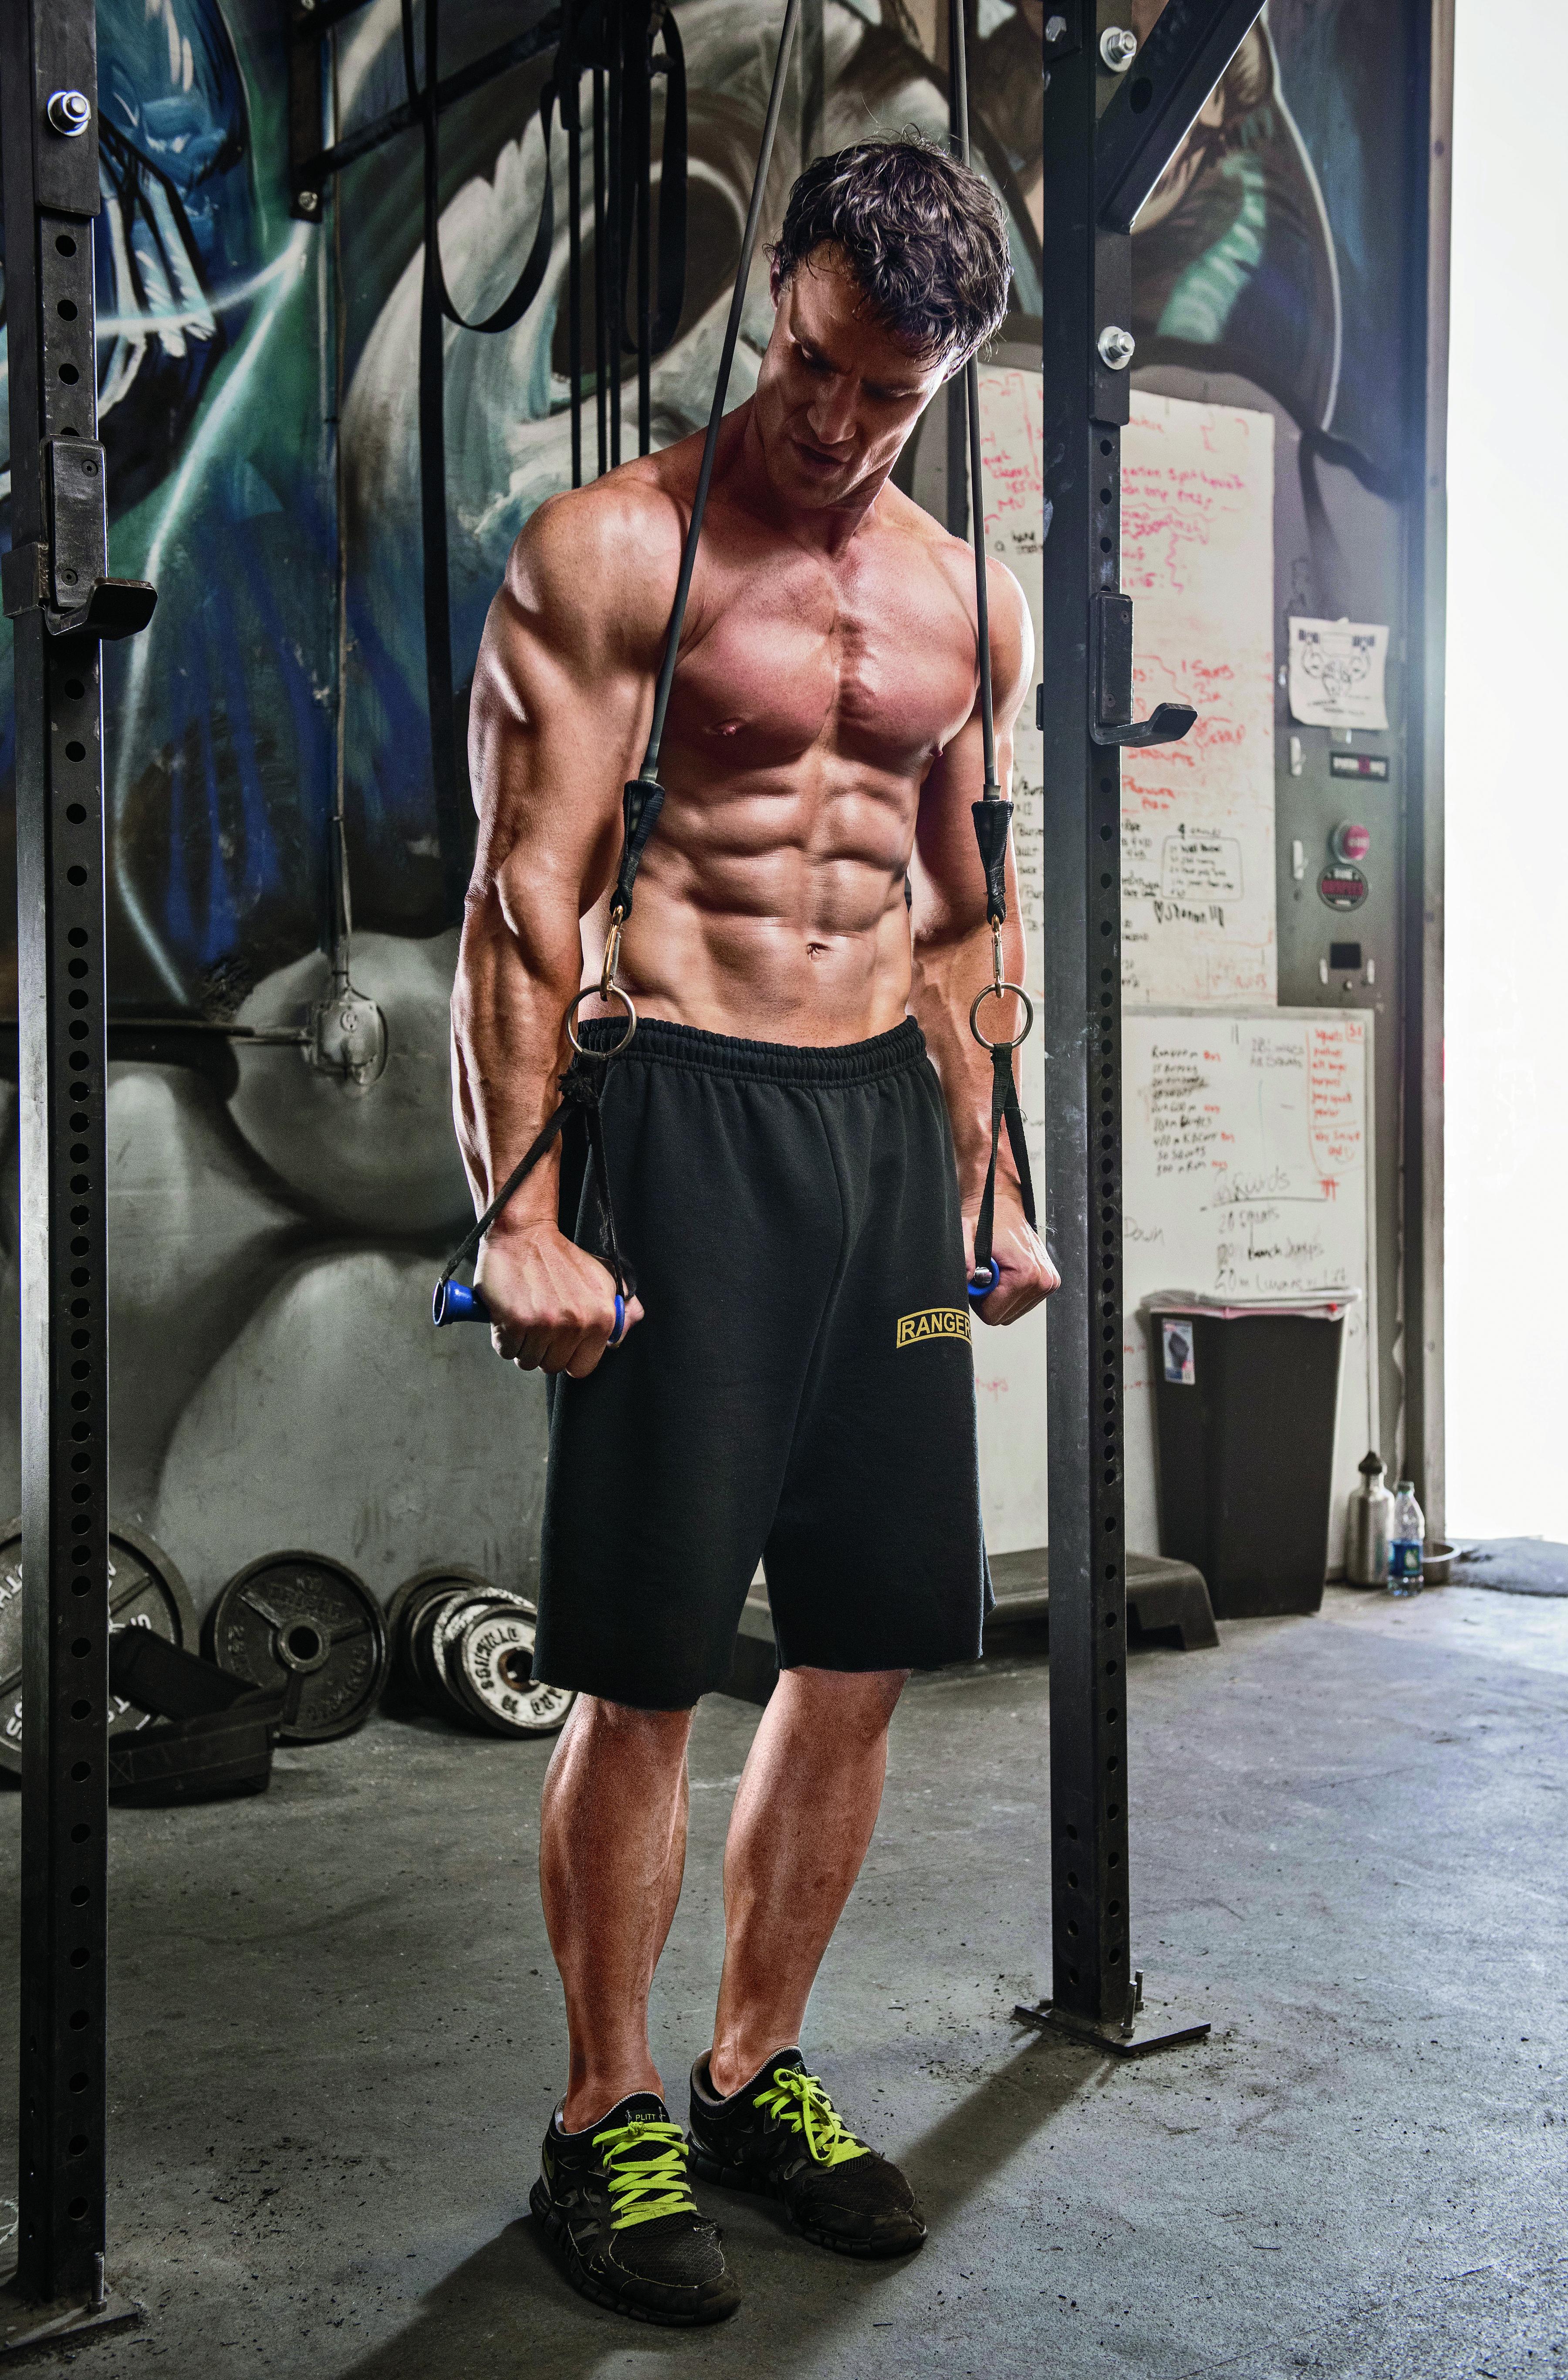 Tréning na triceps. Bomba.